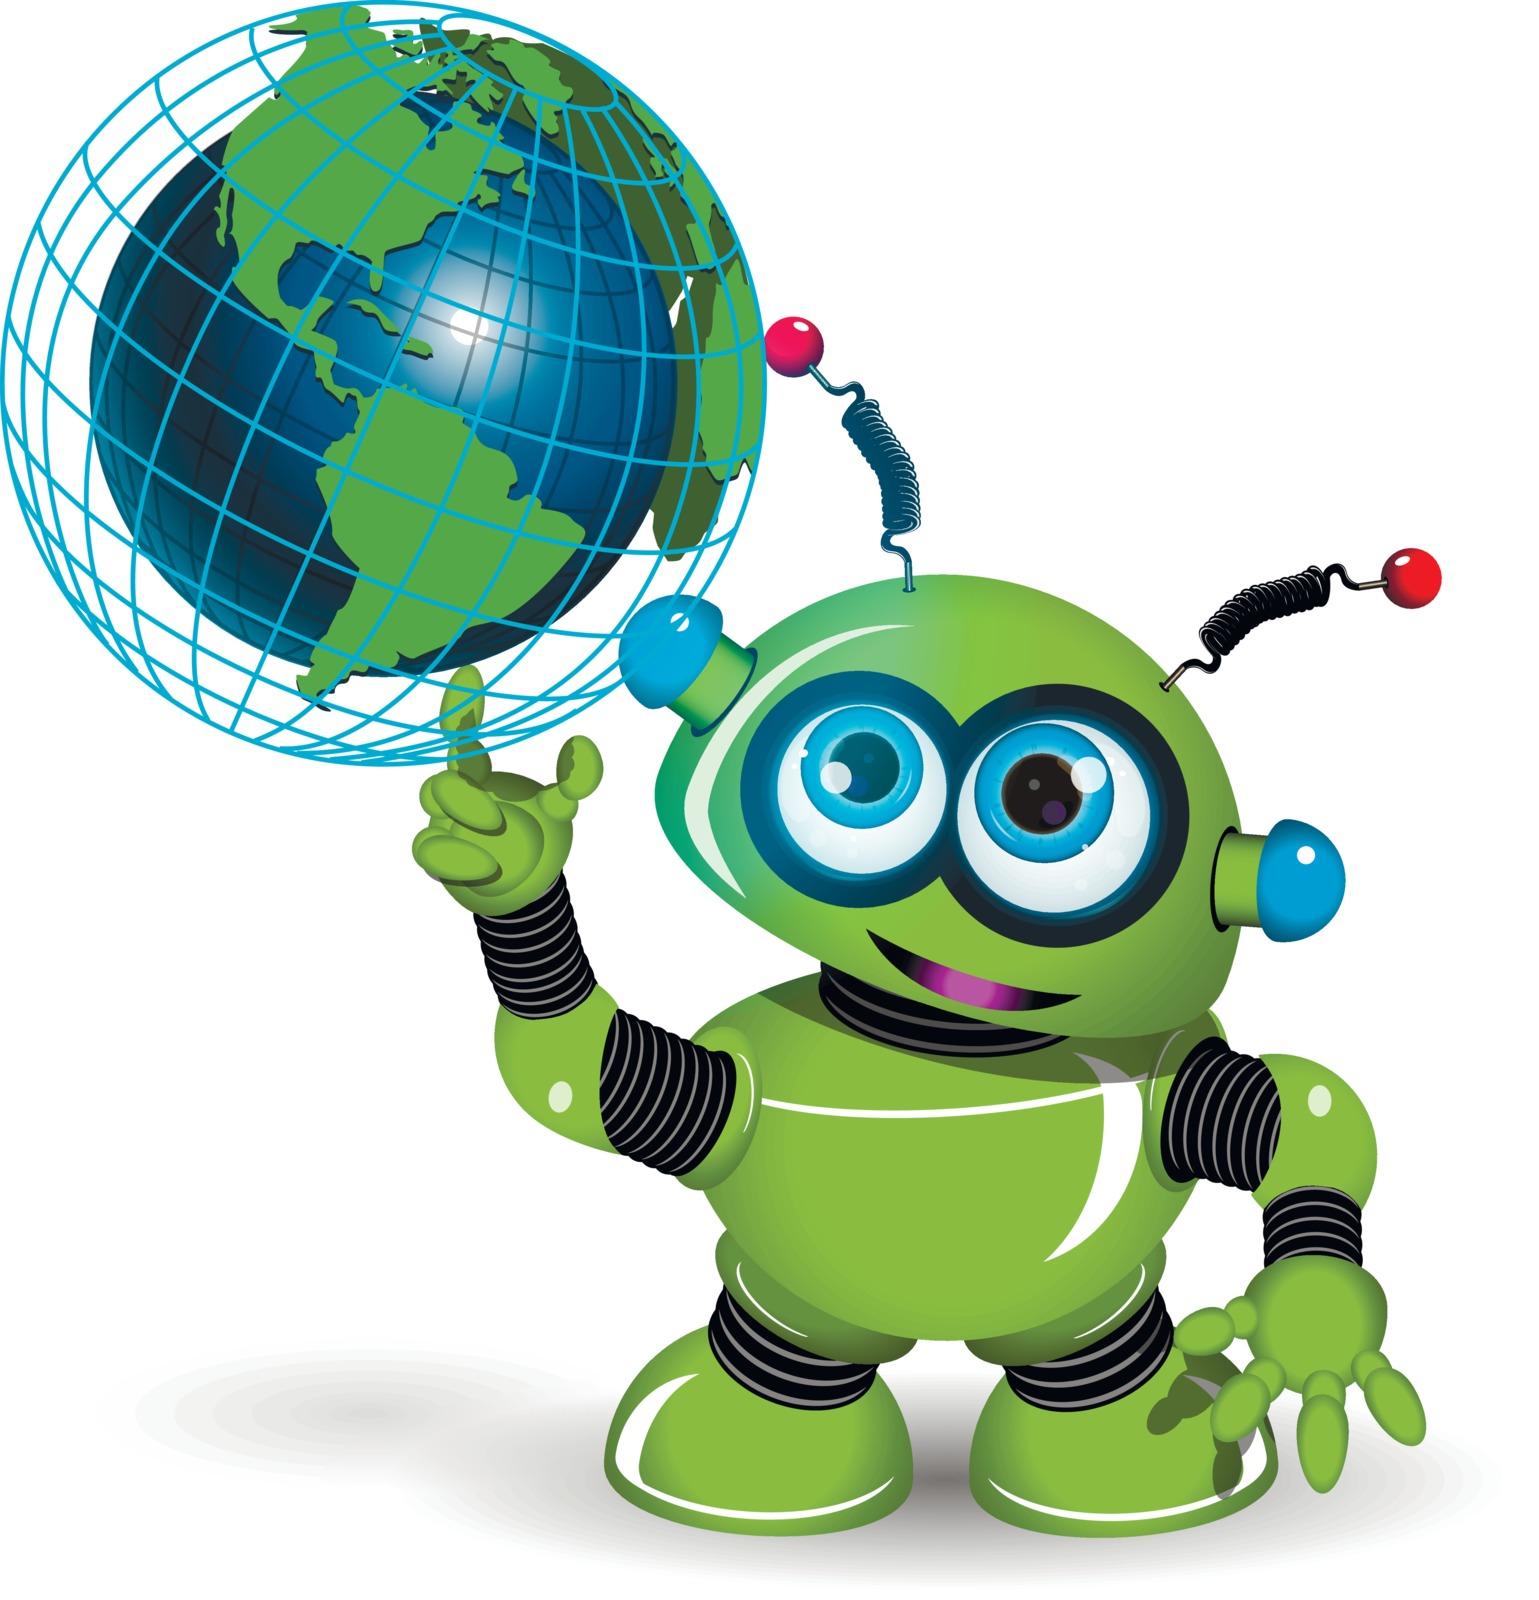 PyAutoGuiで簡単に始めるRPA~Pythonによる業務自動化入門①~